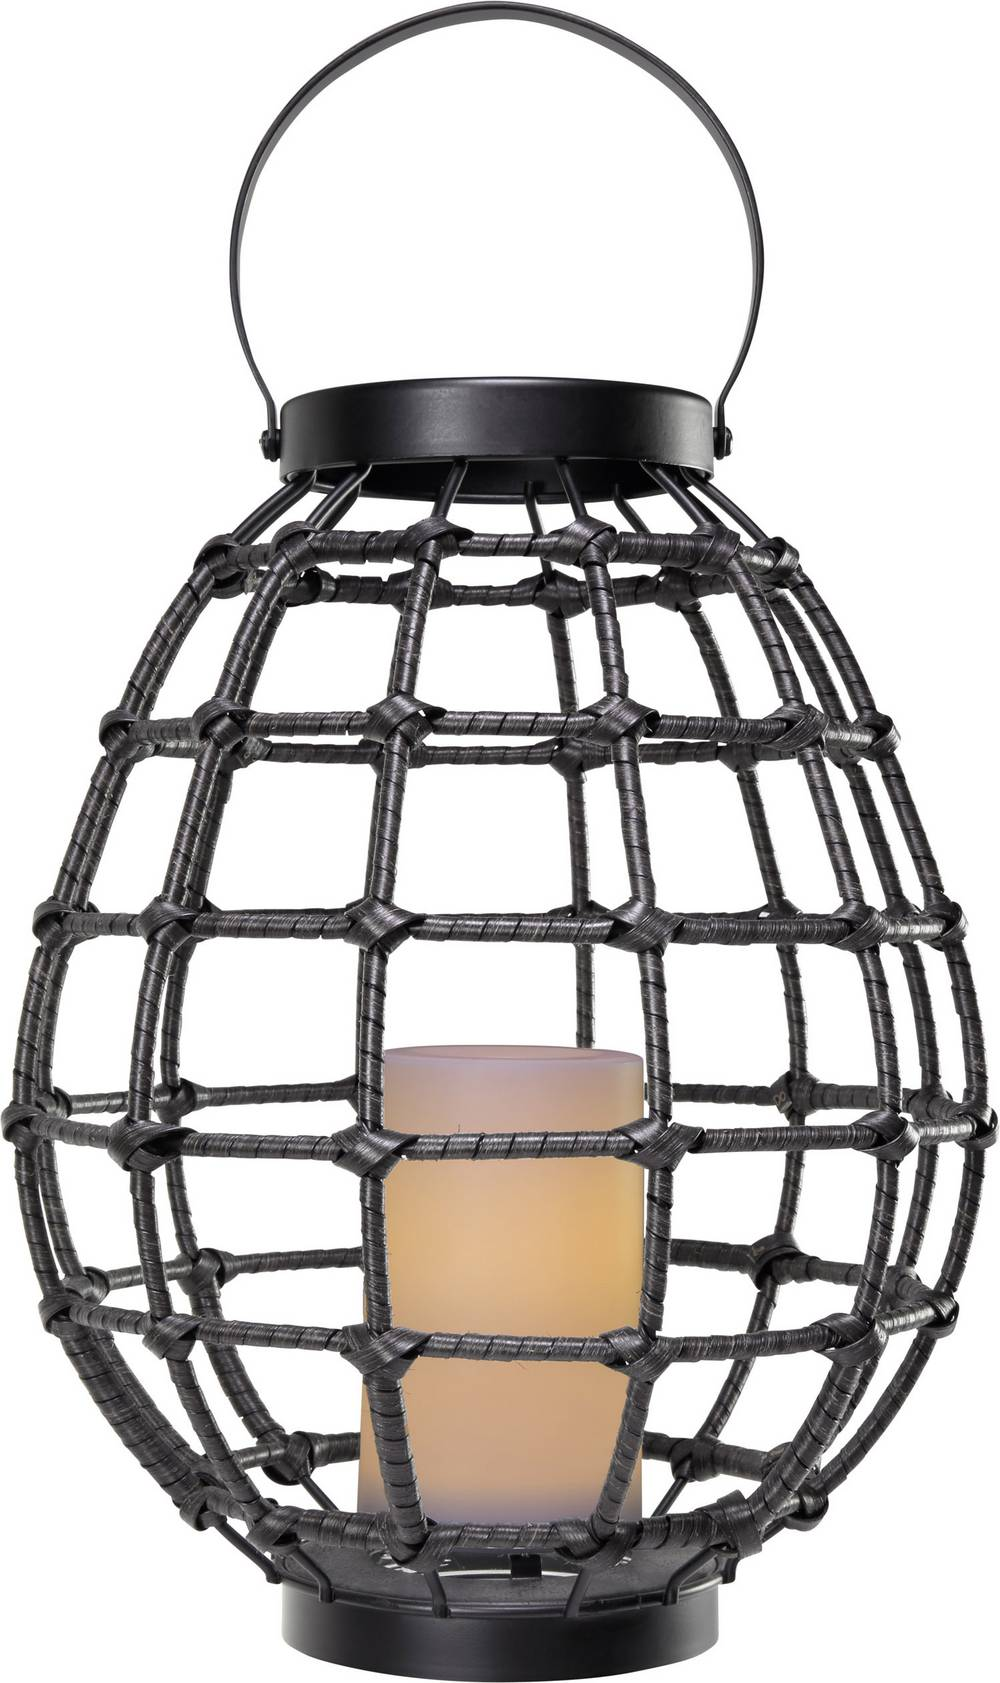 Polarlite-Rattan-330-PL-8375085-Dekoleuchte-LED-0-06W-Amber-Dunkelbraun Indexbild 2